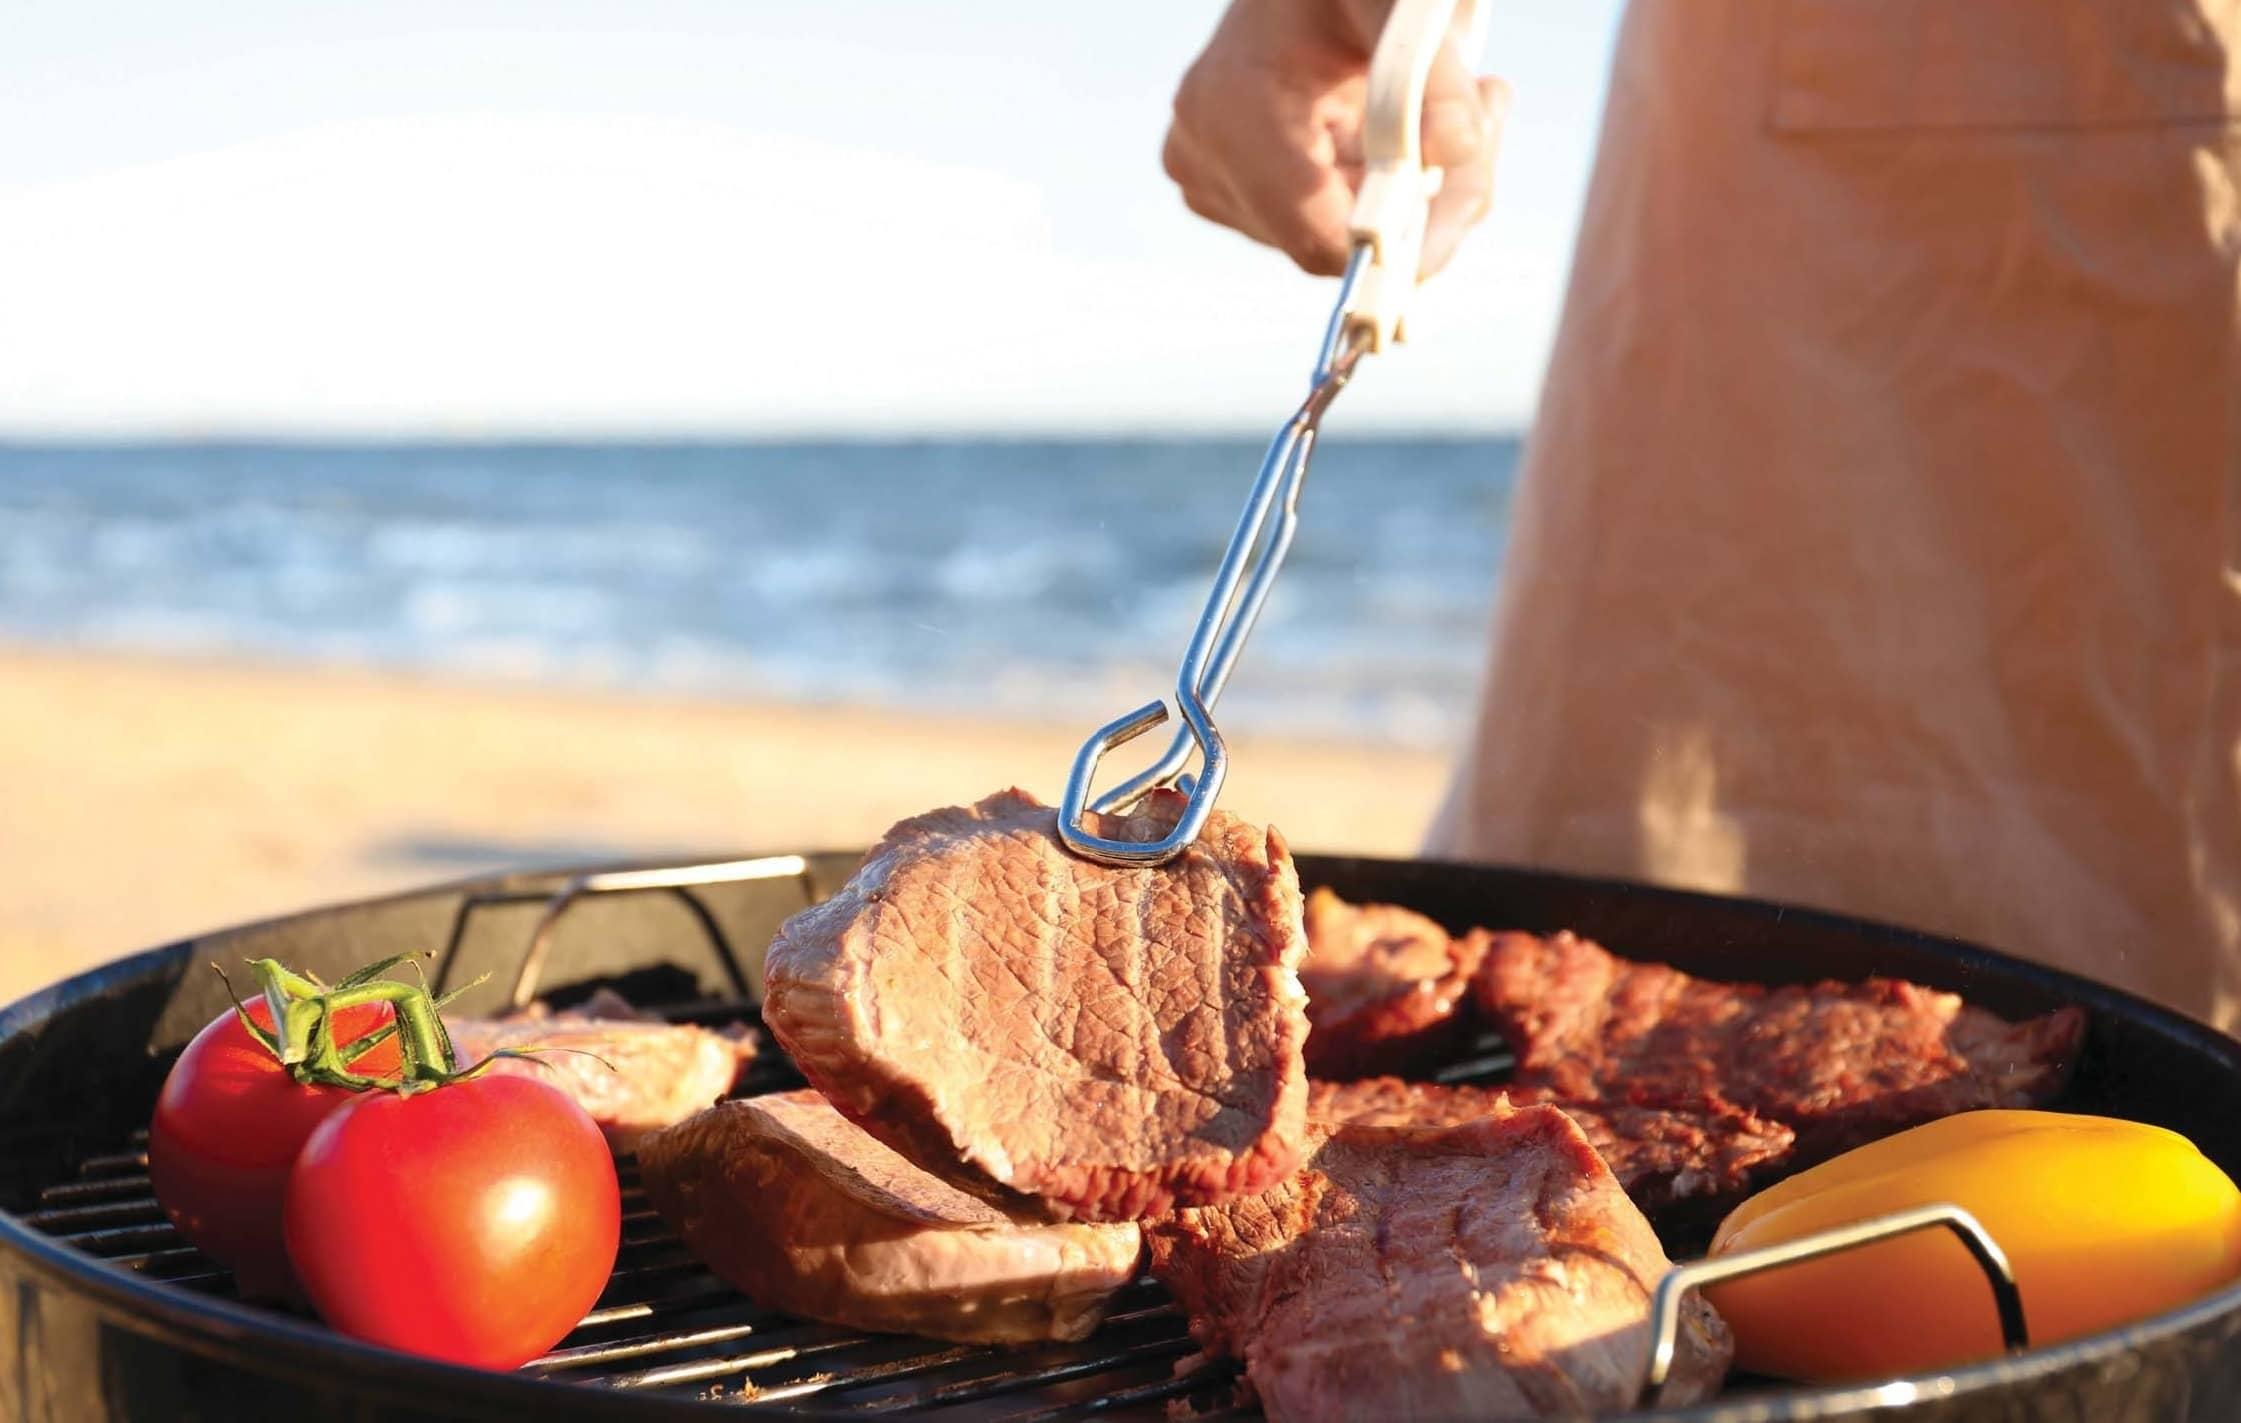 The Keto-Friendly South Beach Diet